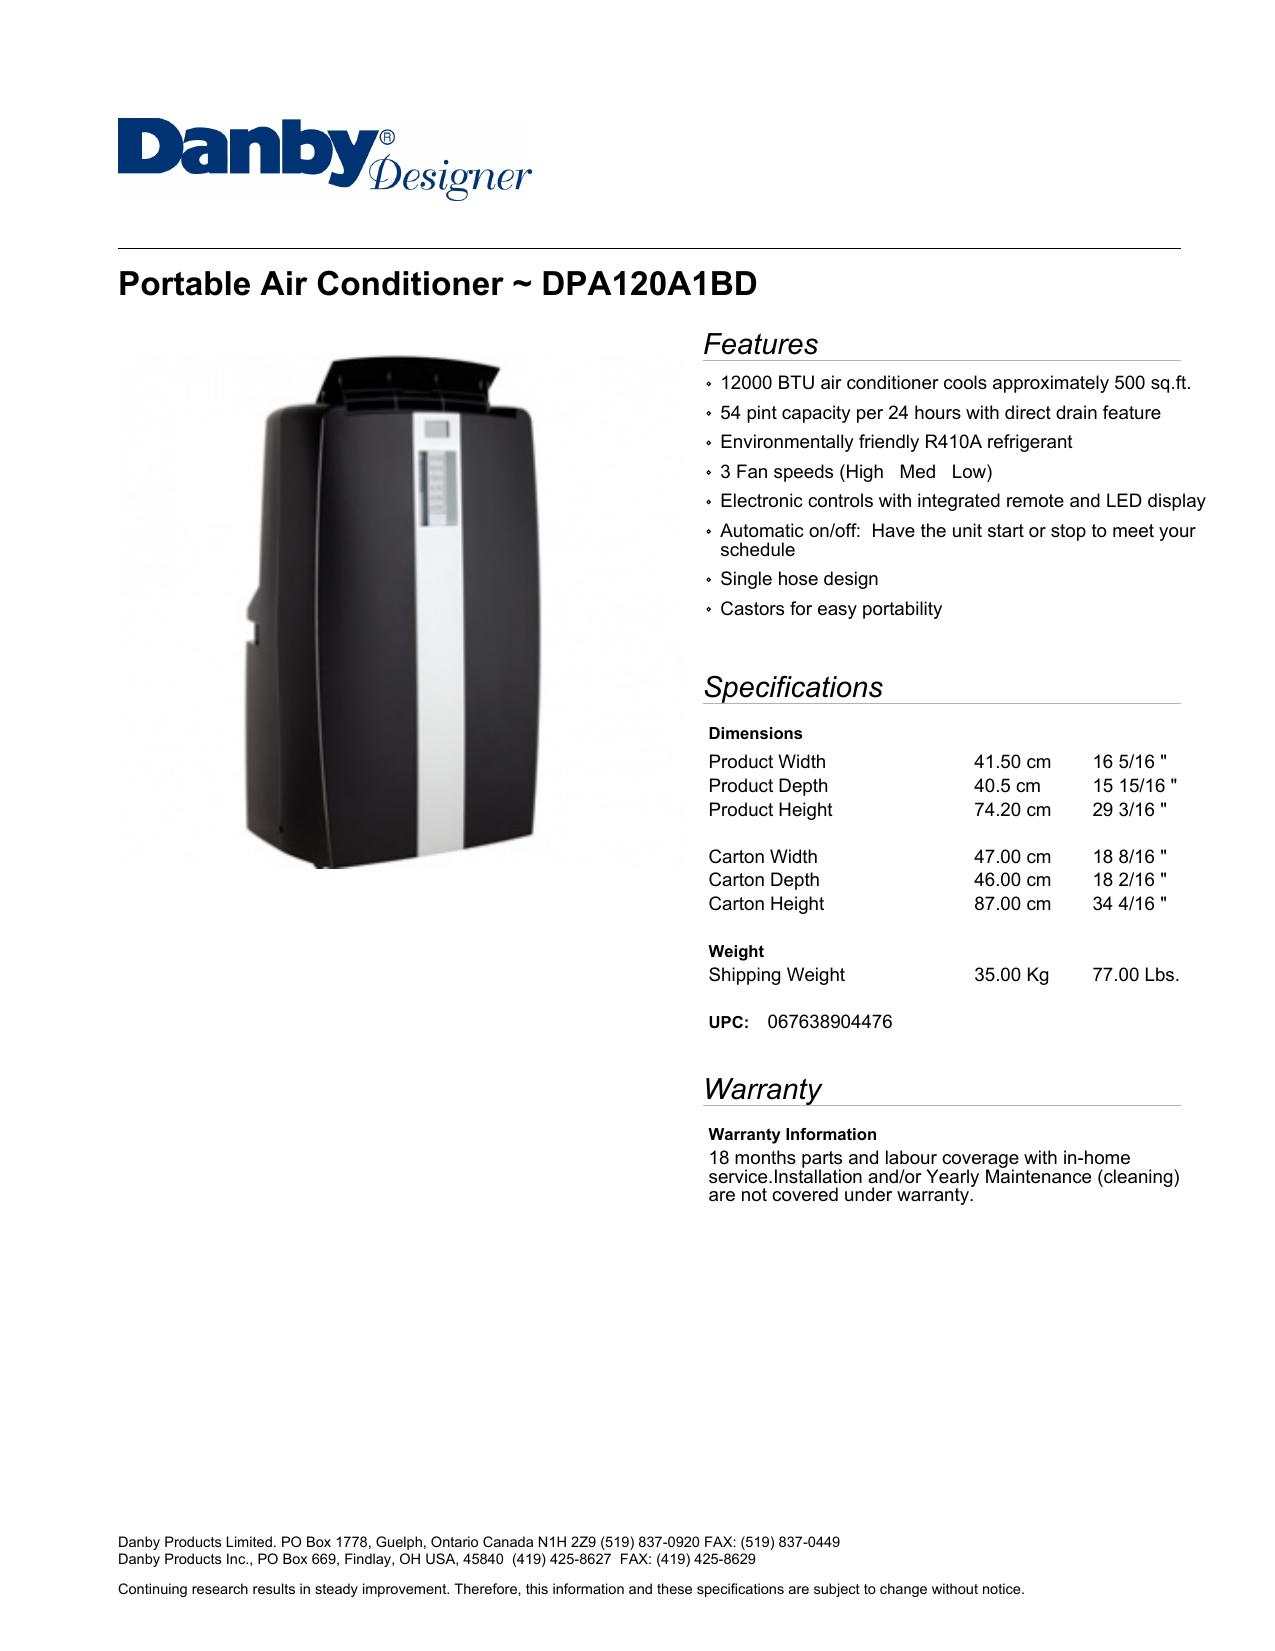 Portable Air Conditioner Dpa120a1bd Manualzz